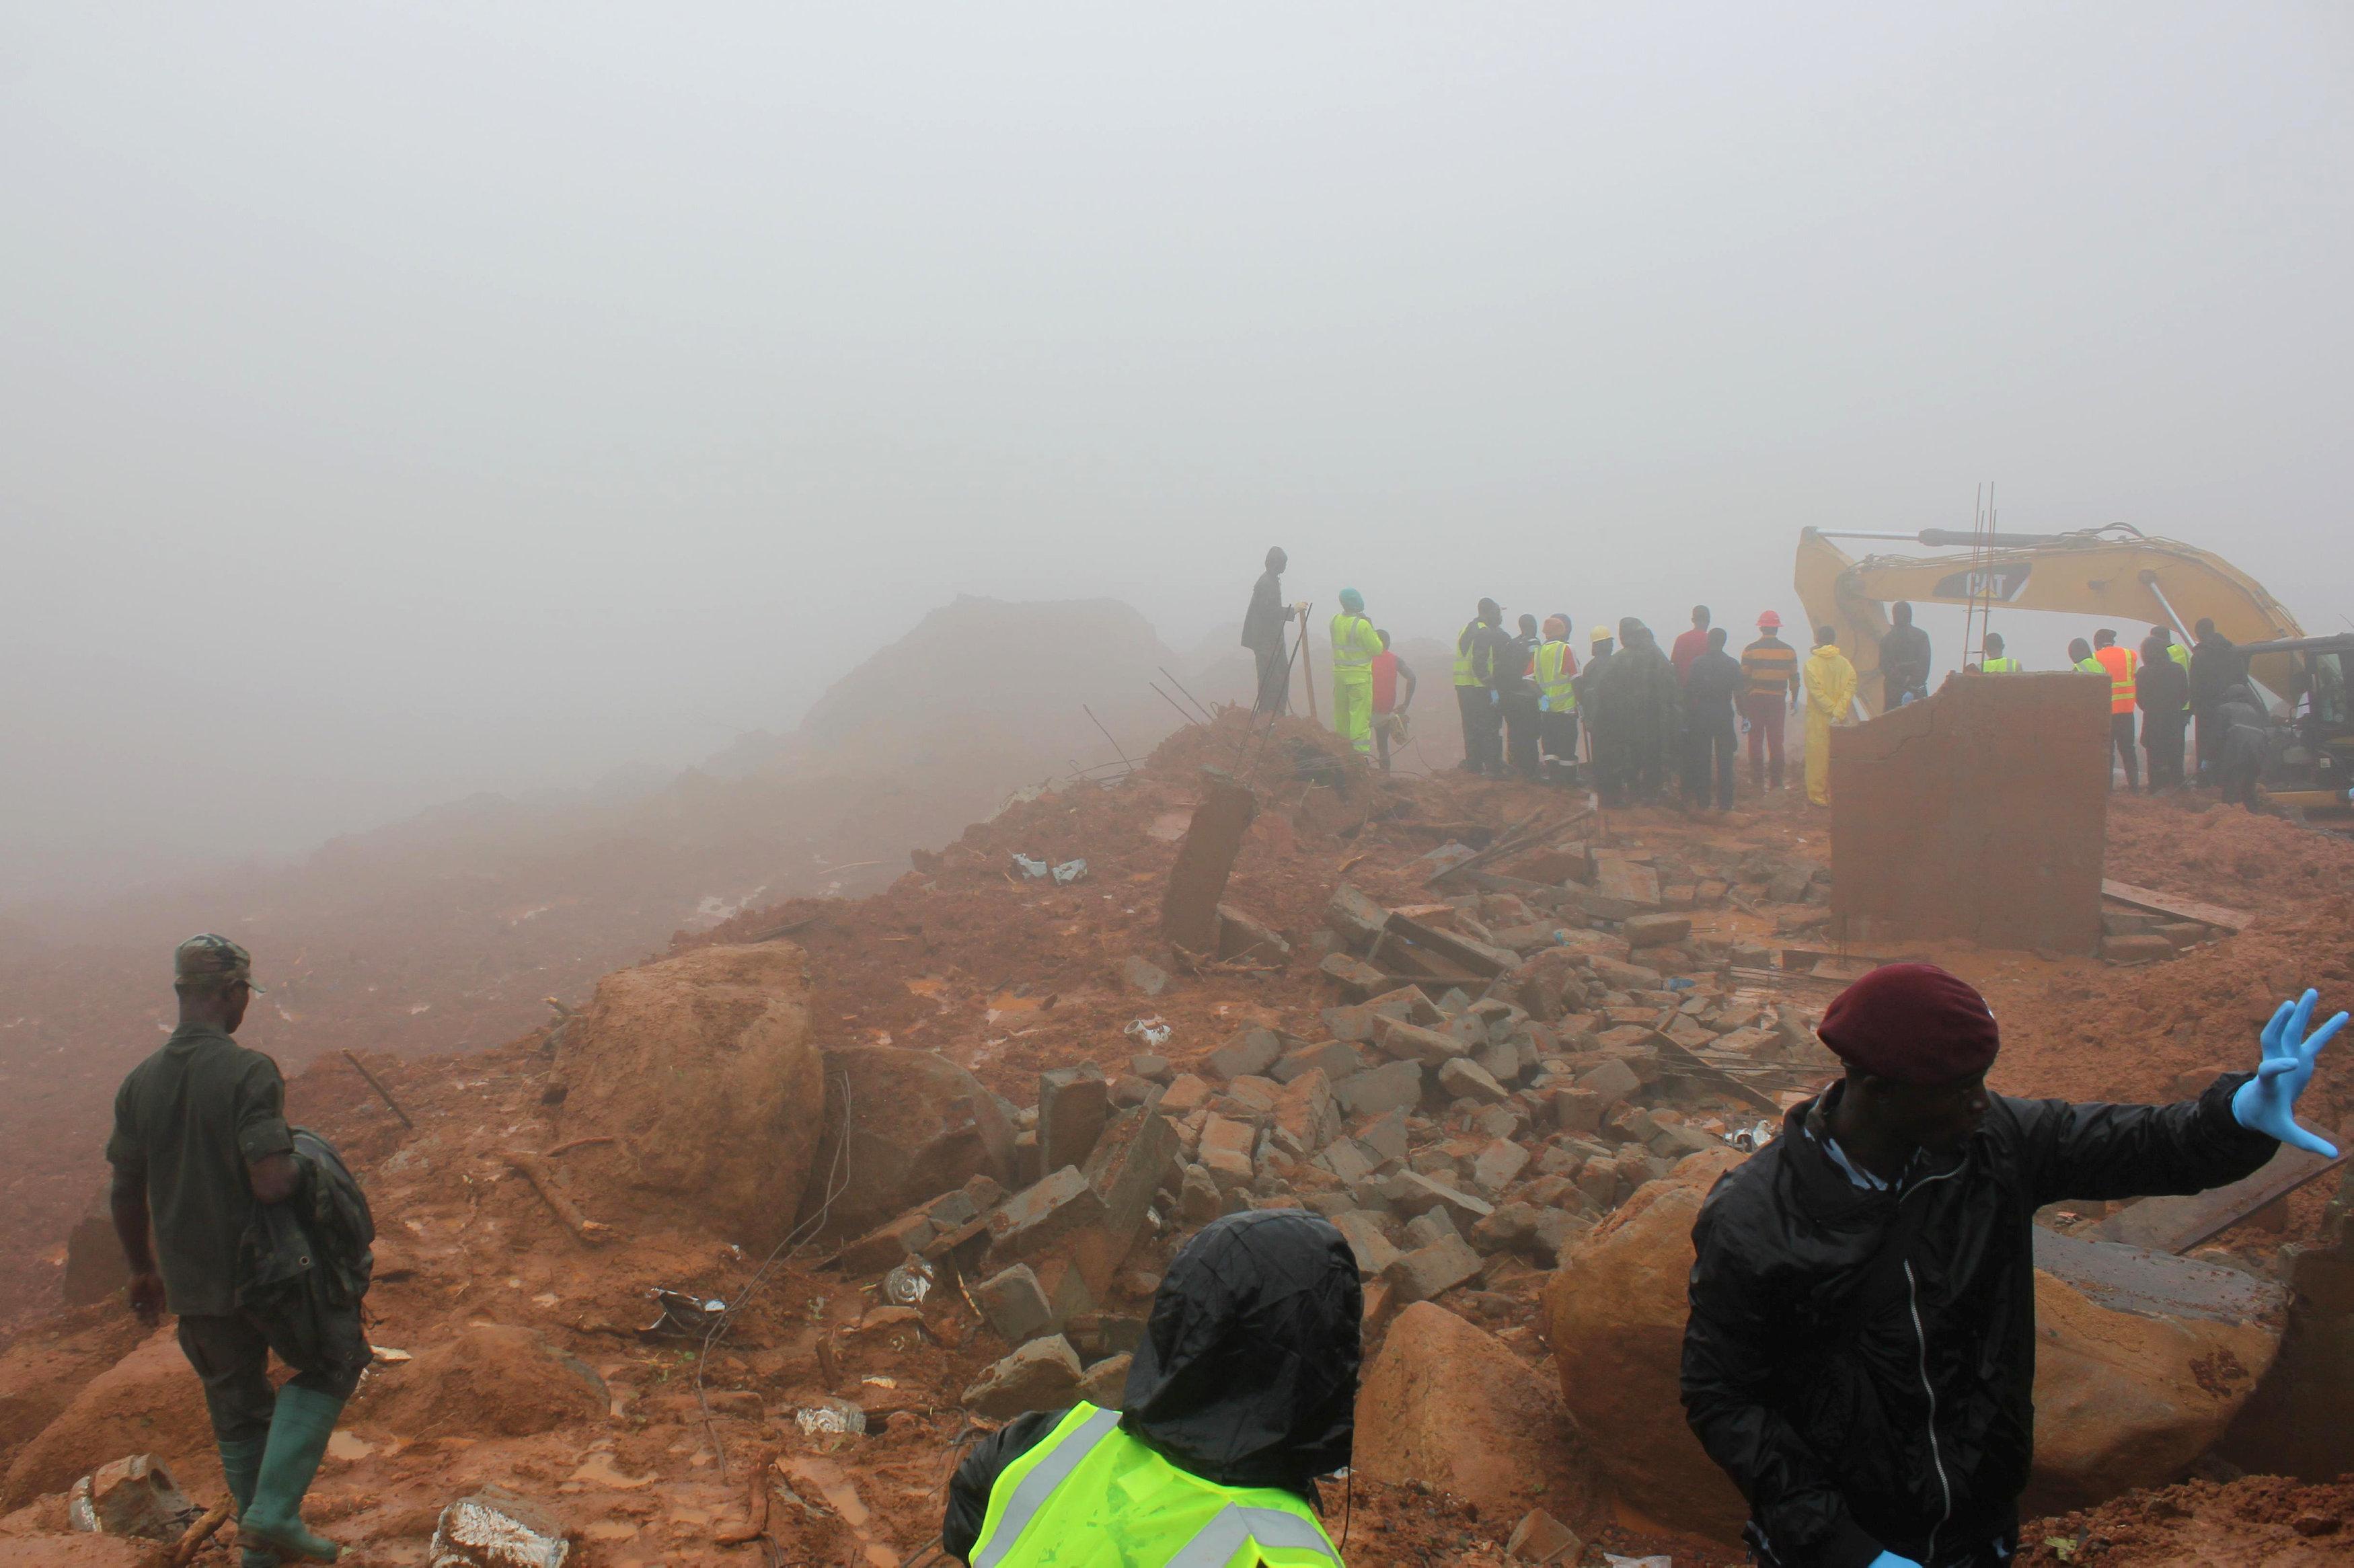 In pictures: Sierra Leone mudslide